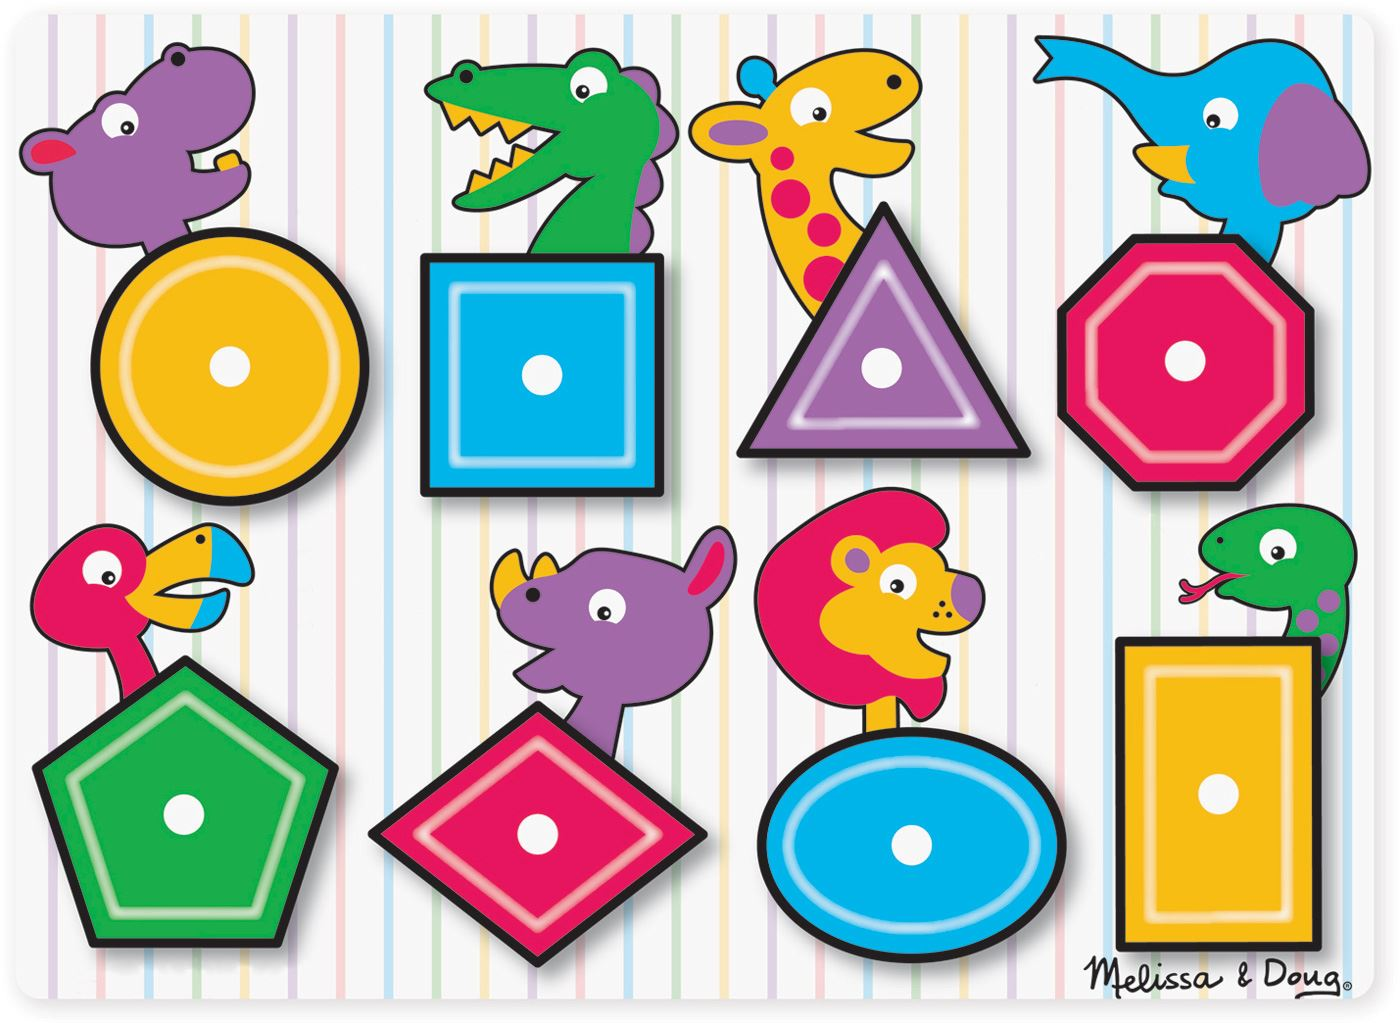 Melissa /& Doug SEE INSIDE WOODEN PEG PUZZLE//JIGSAW ALPHABET Toddler Toy//Gift BN